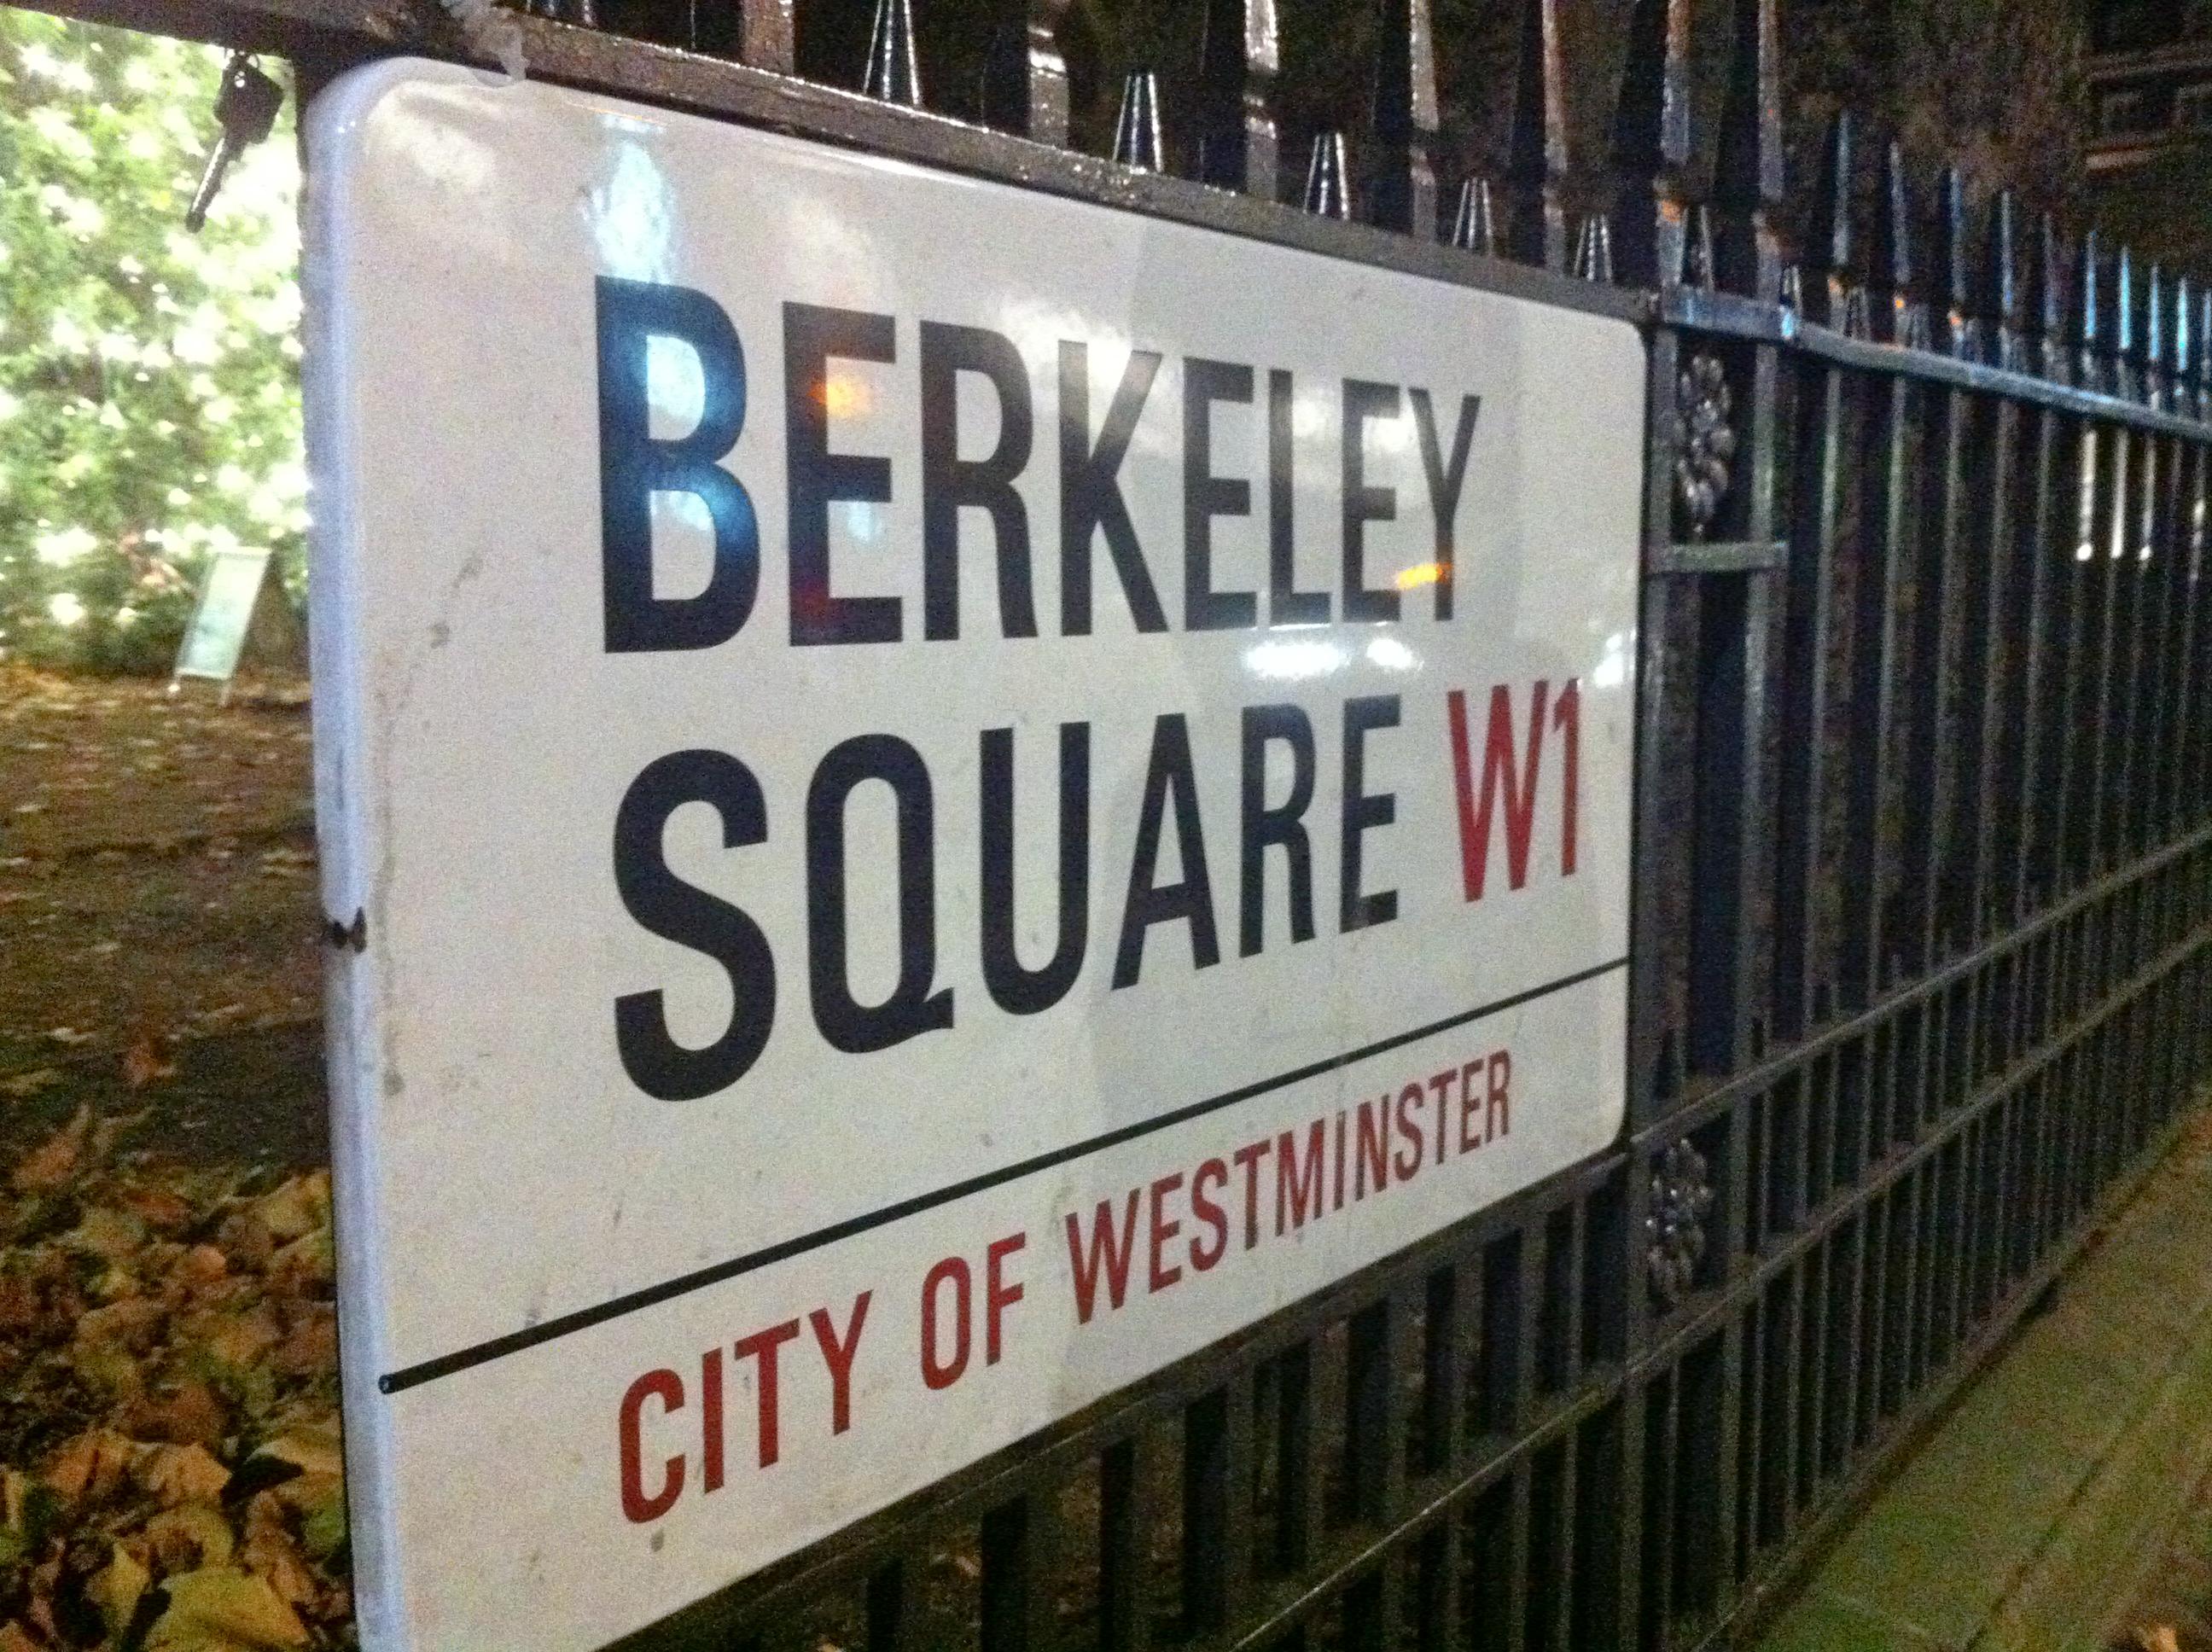 Dating agency berkeley square